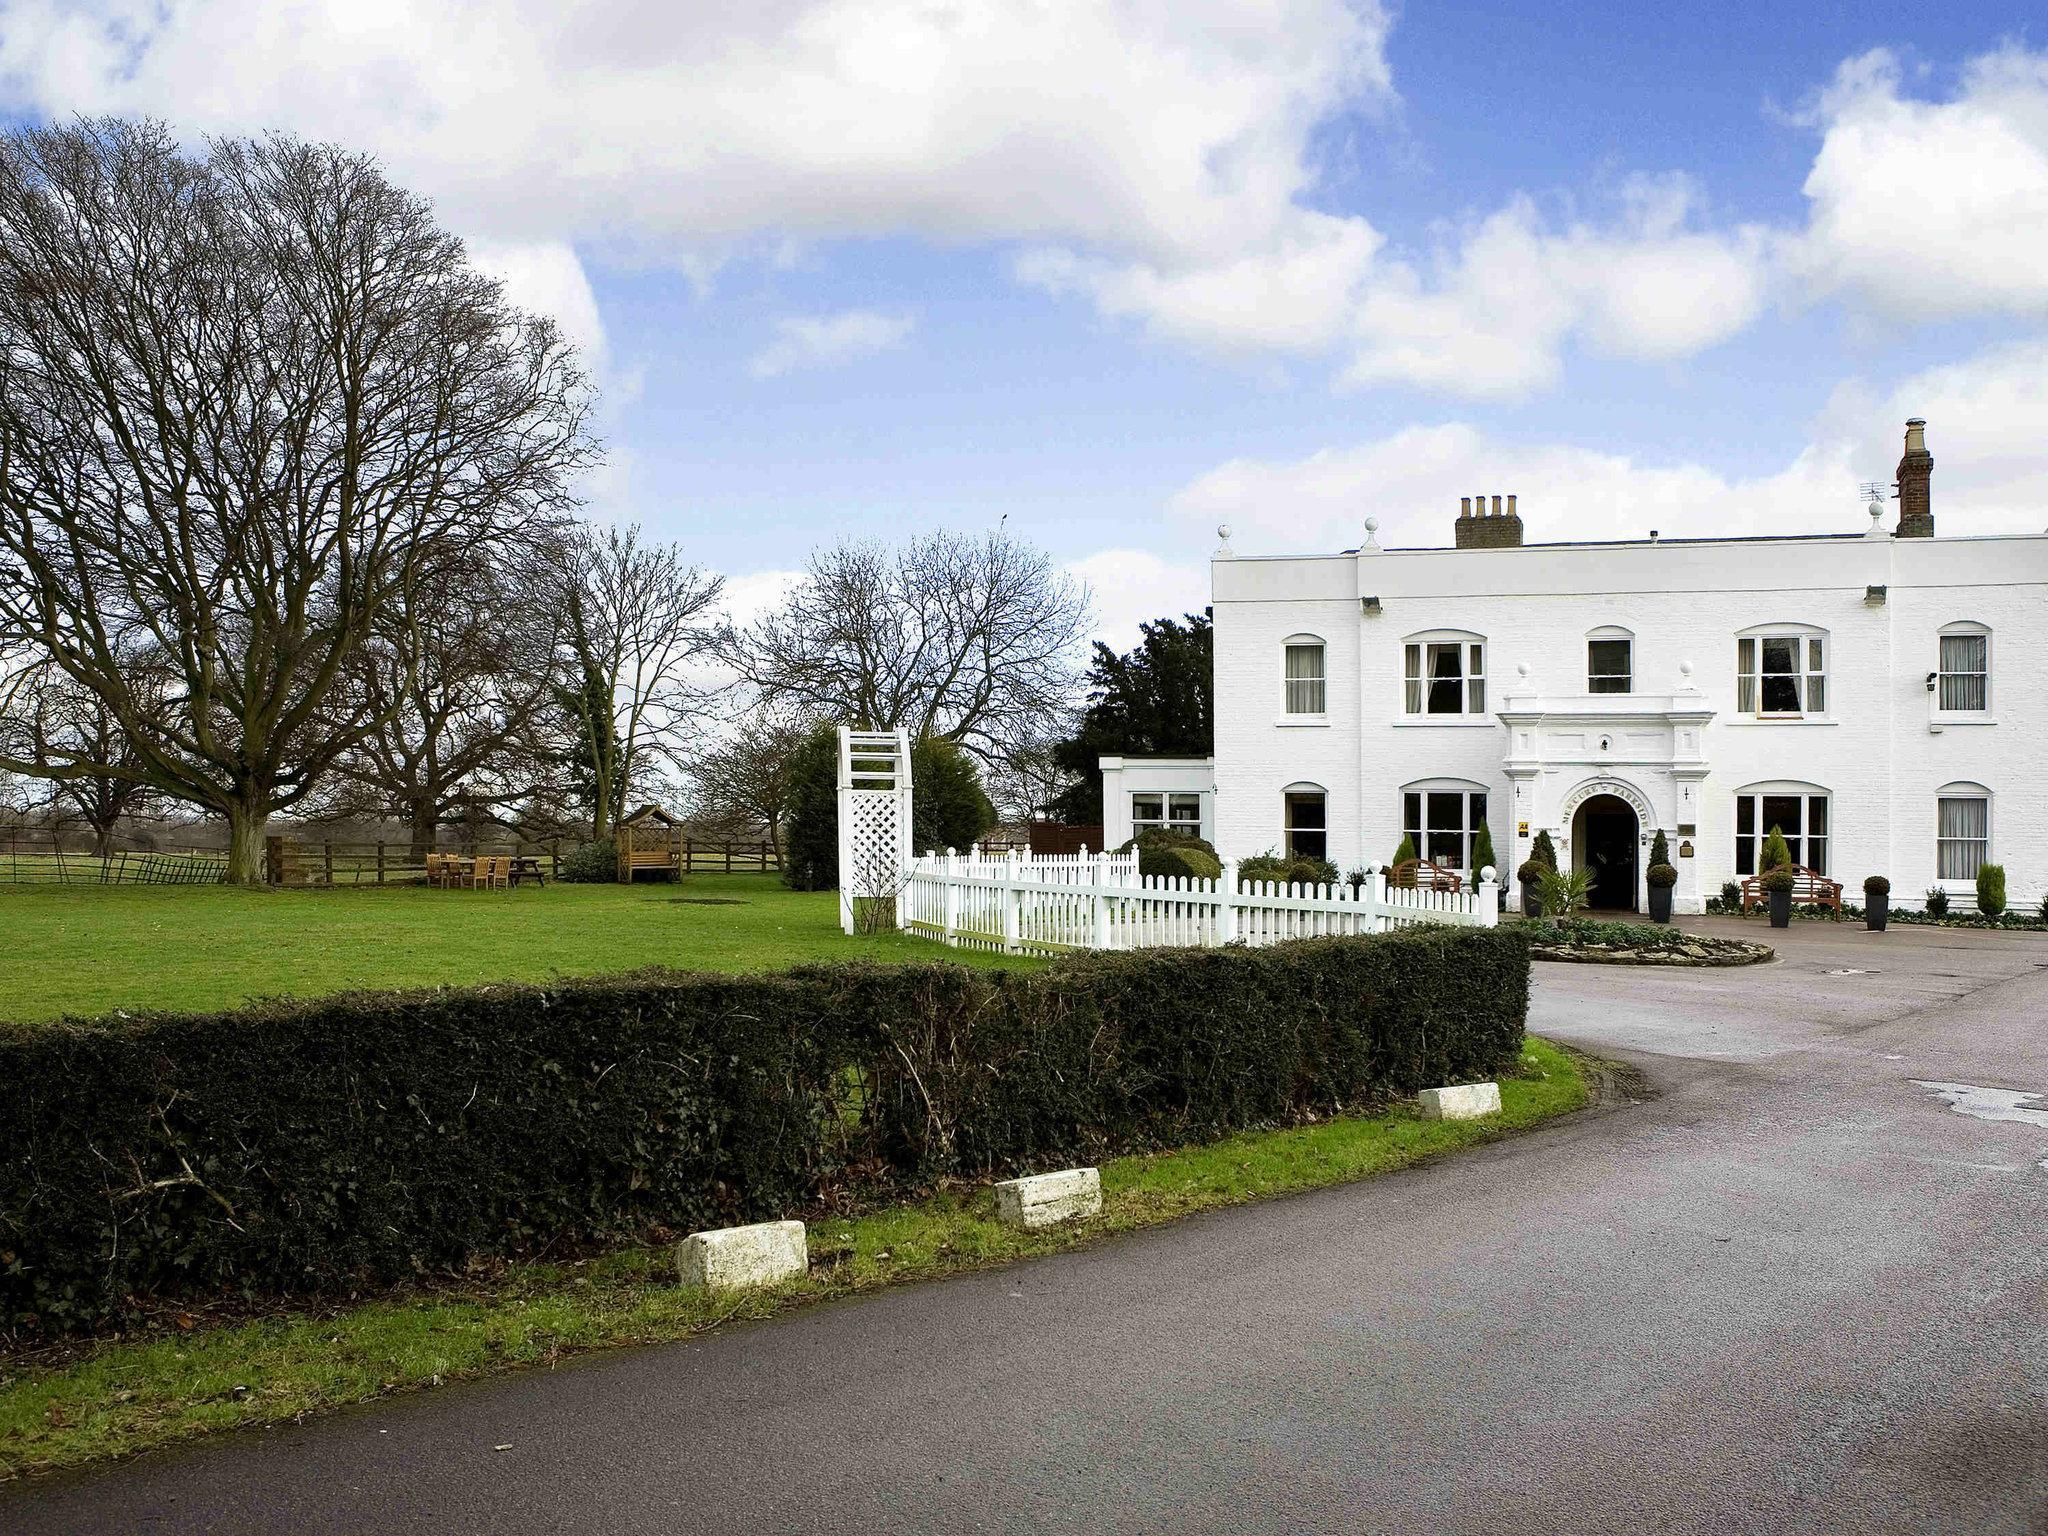 Woughton House - Mgallery, Milton Keynes